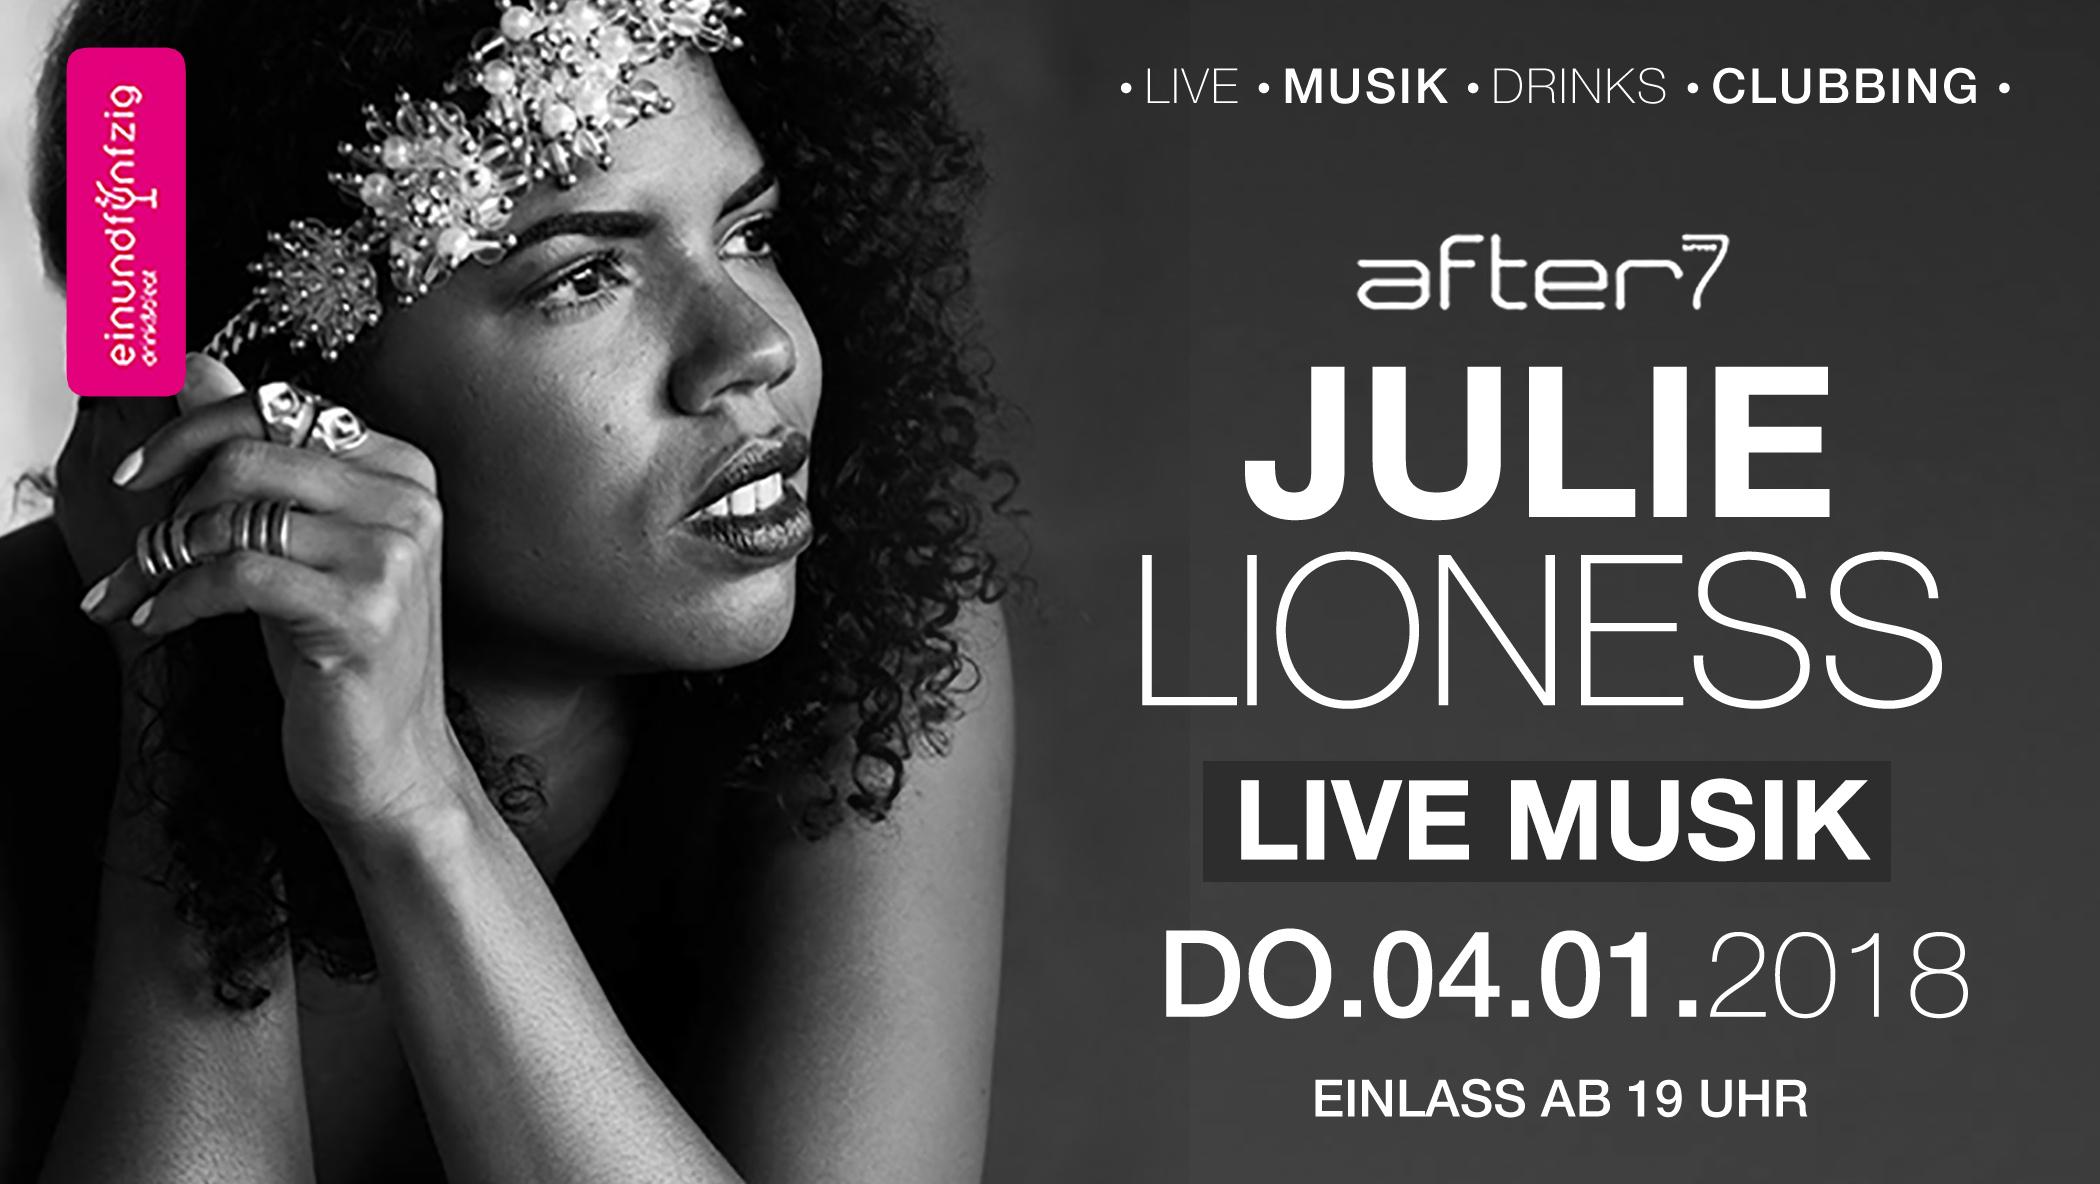 04.01.2018 – JULIE LIONESS @after7